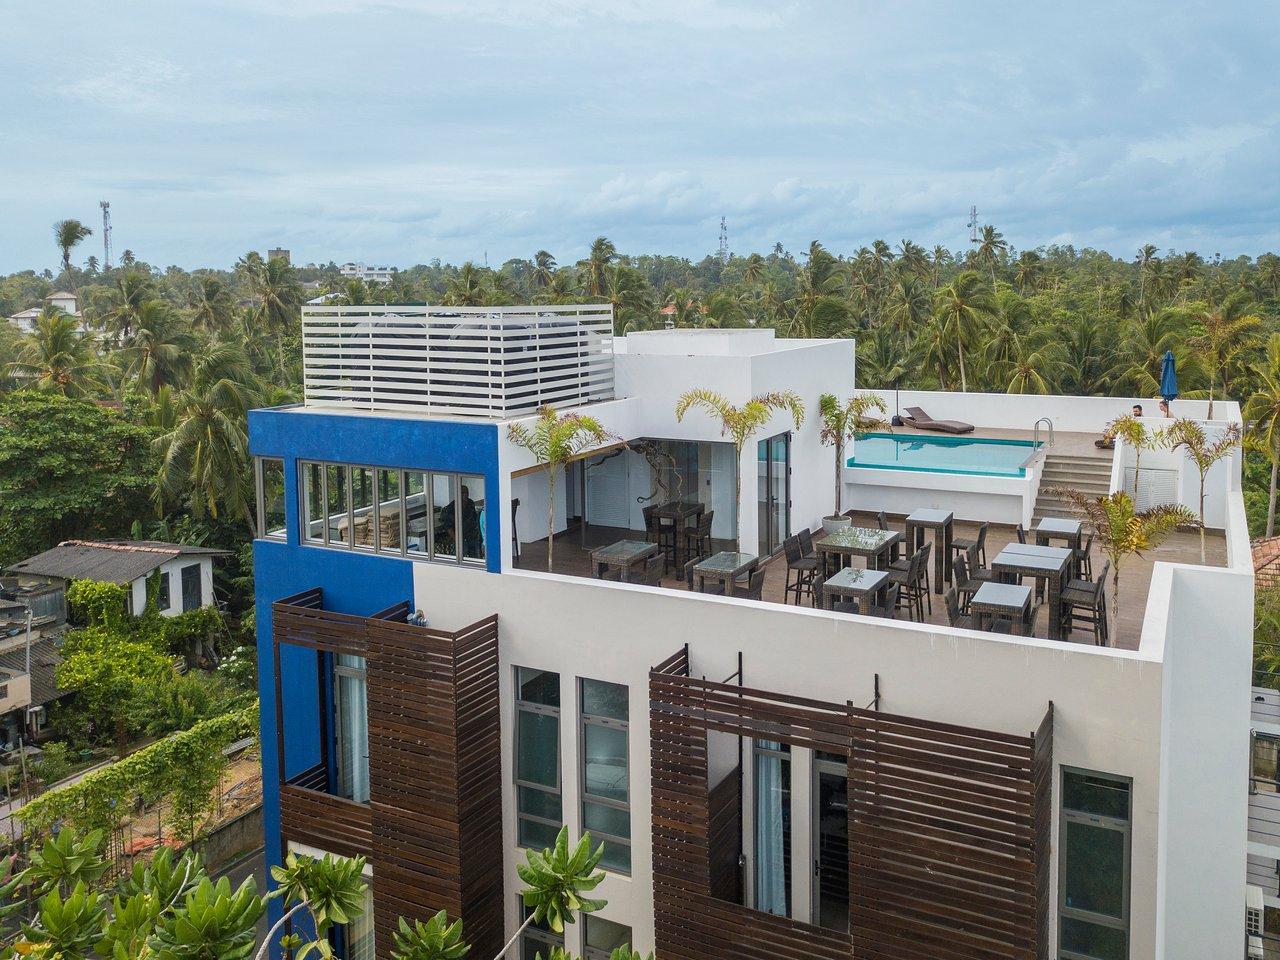 Kai Hikkaduwa Updated 2018 Specialty Bb Reviews Price Sabun Hotel Beauty Comparison Sri Lanka Tripadvisor